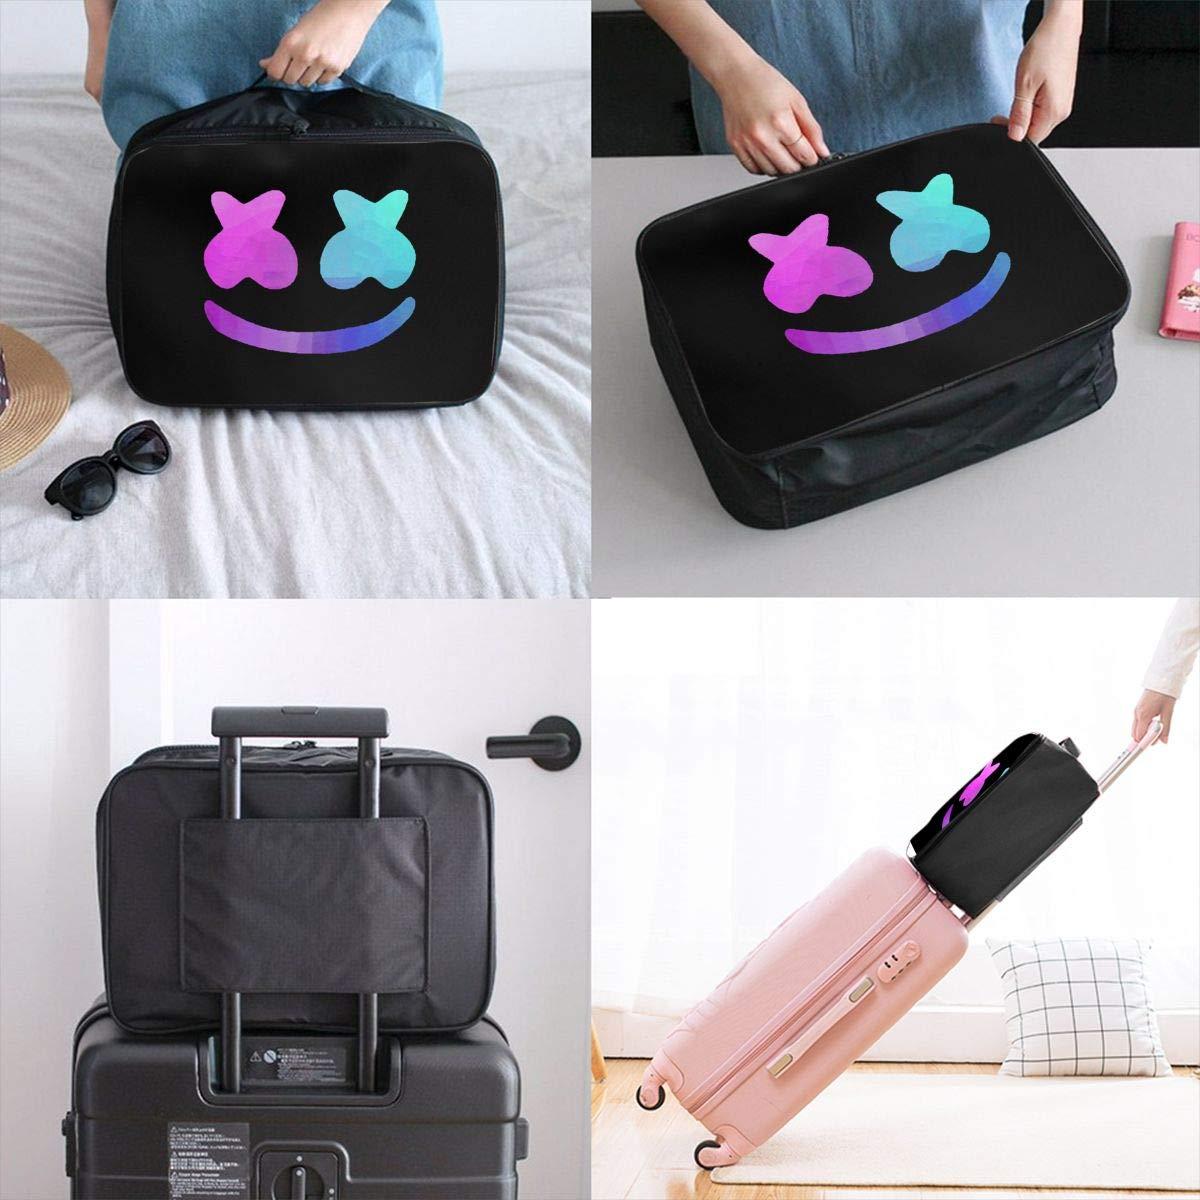 Fretlo Marshmellow-Mask-Blue-Violet Travel Duffel Bag Waterproof Lightweight Large Capacity Portable Luggage Bag Black